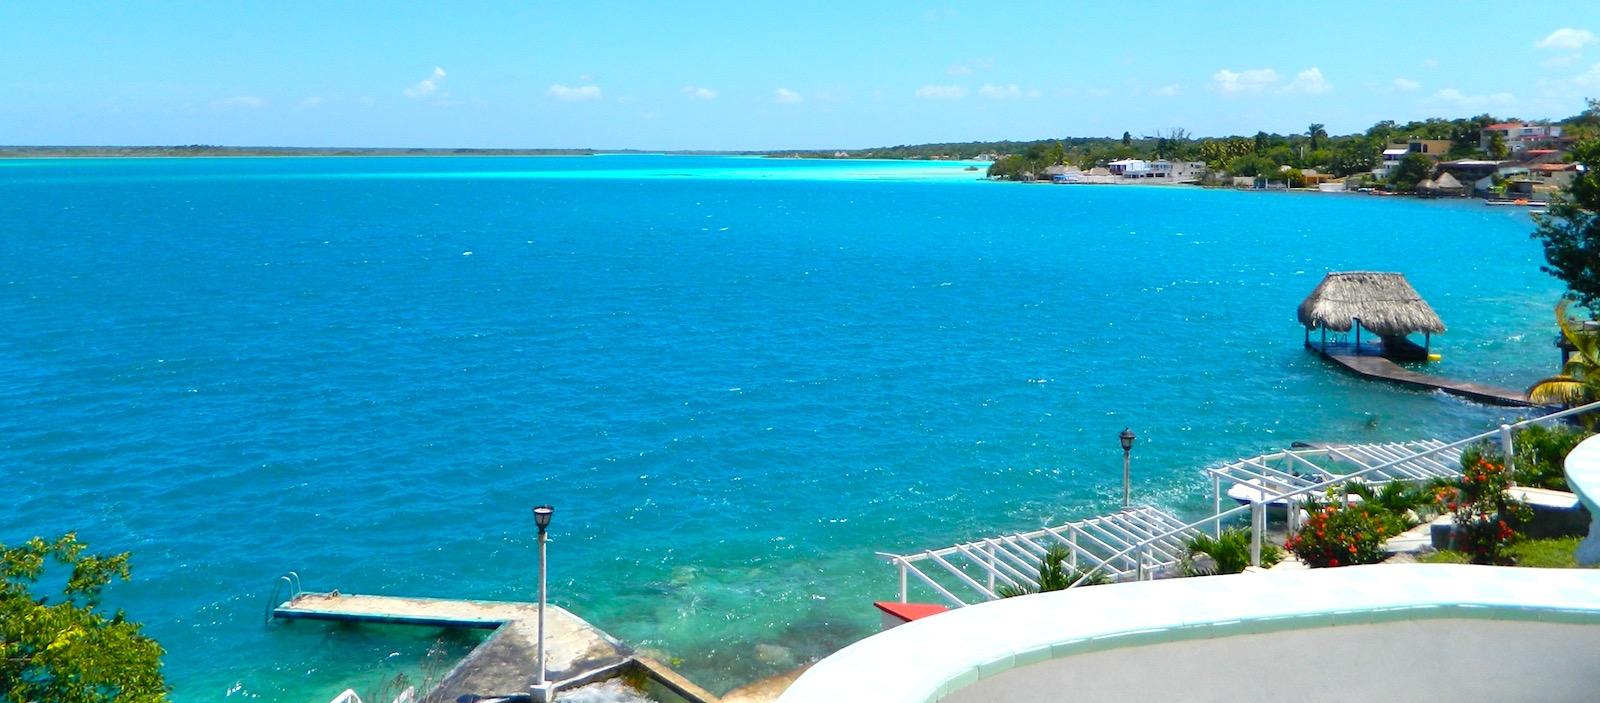 Bacalar - The most beautiful lagoon in The Mayan Coast